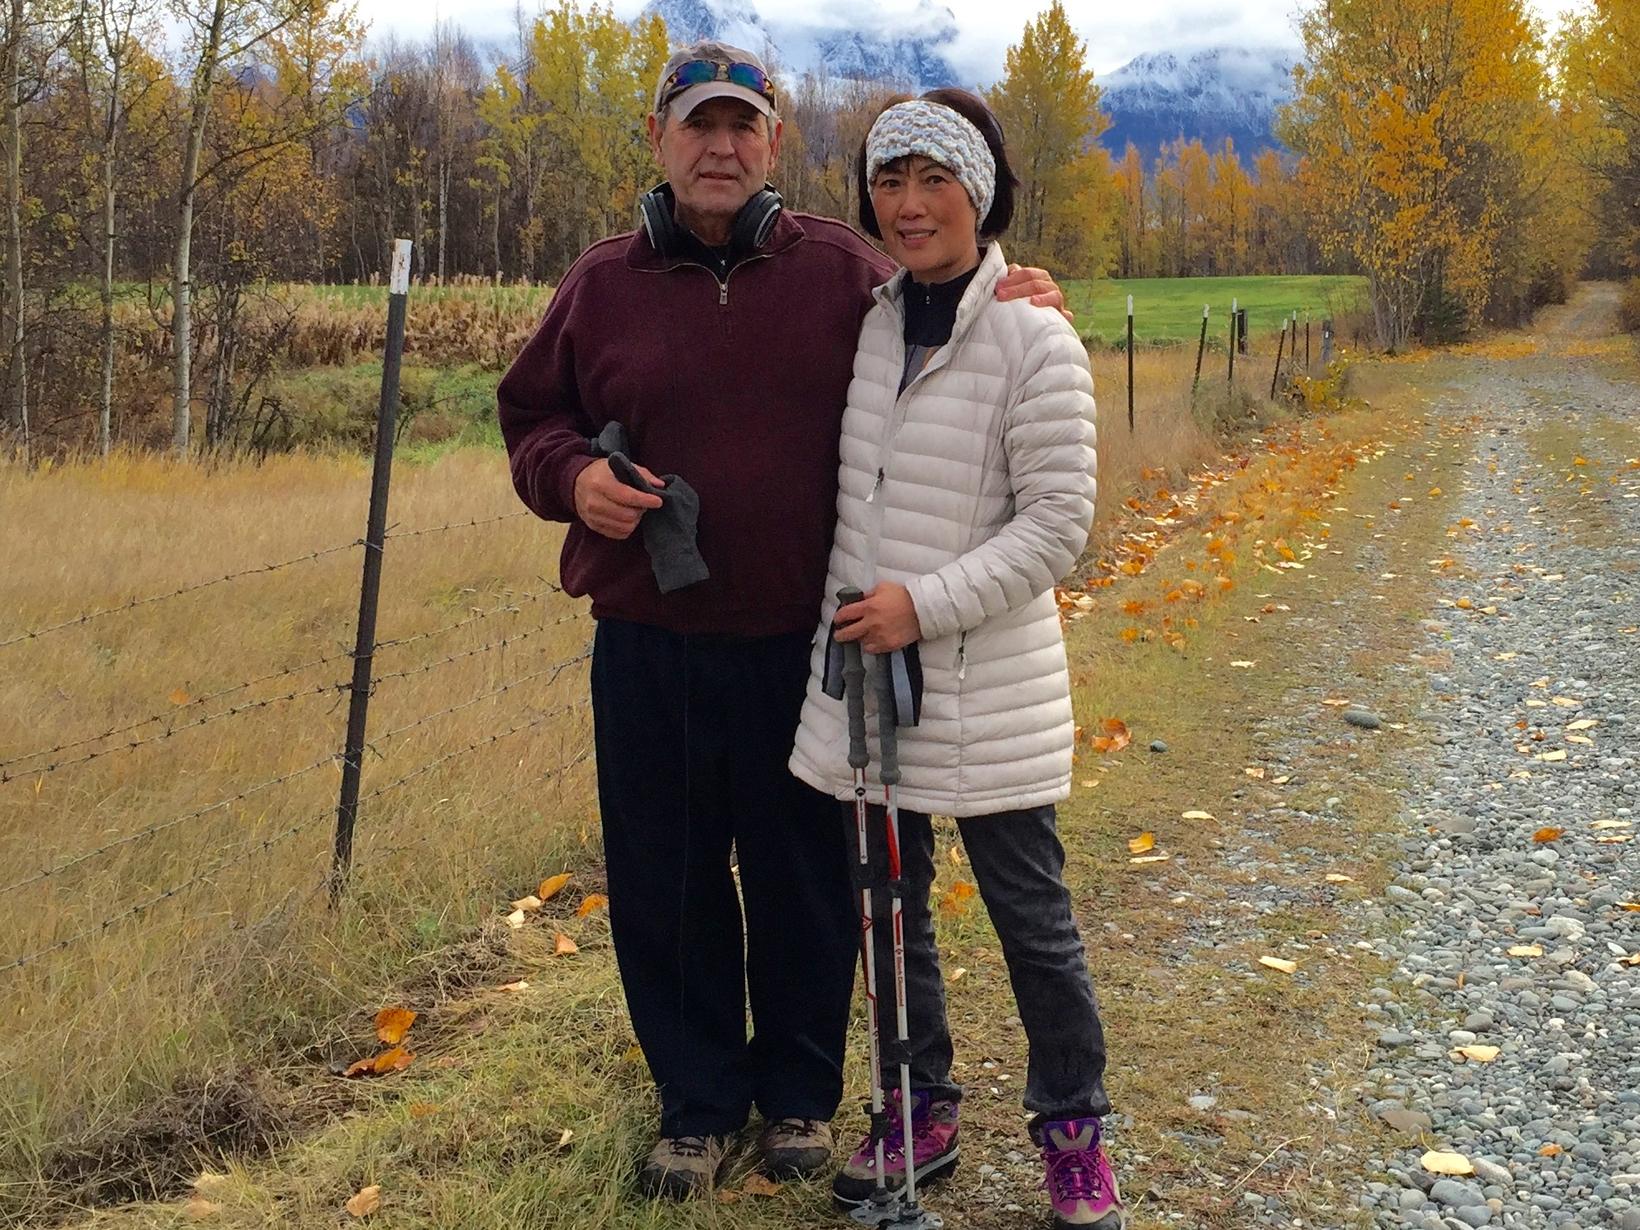 Peter & maria & Maria from Wasilla, Alaska, United States